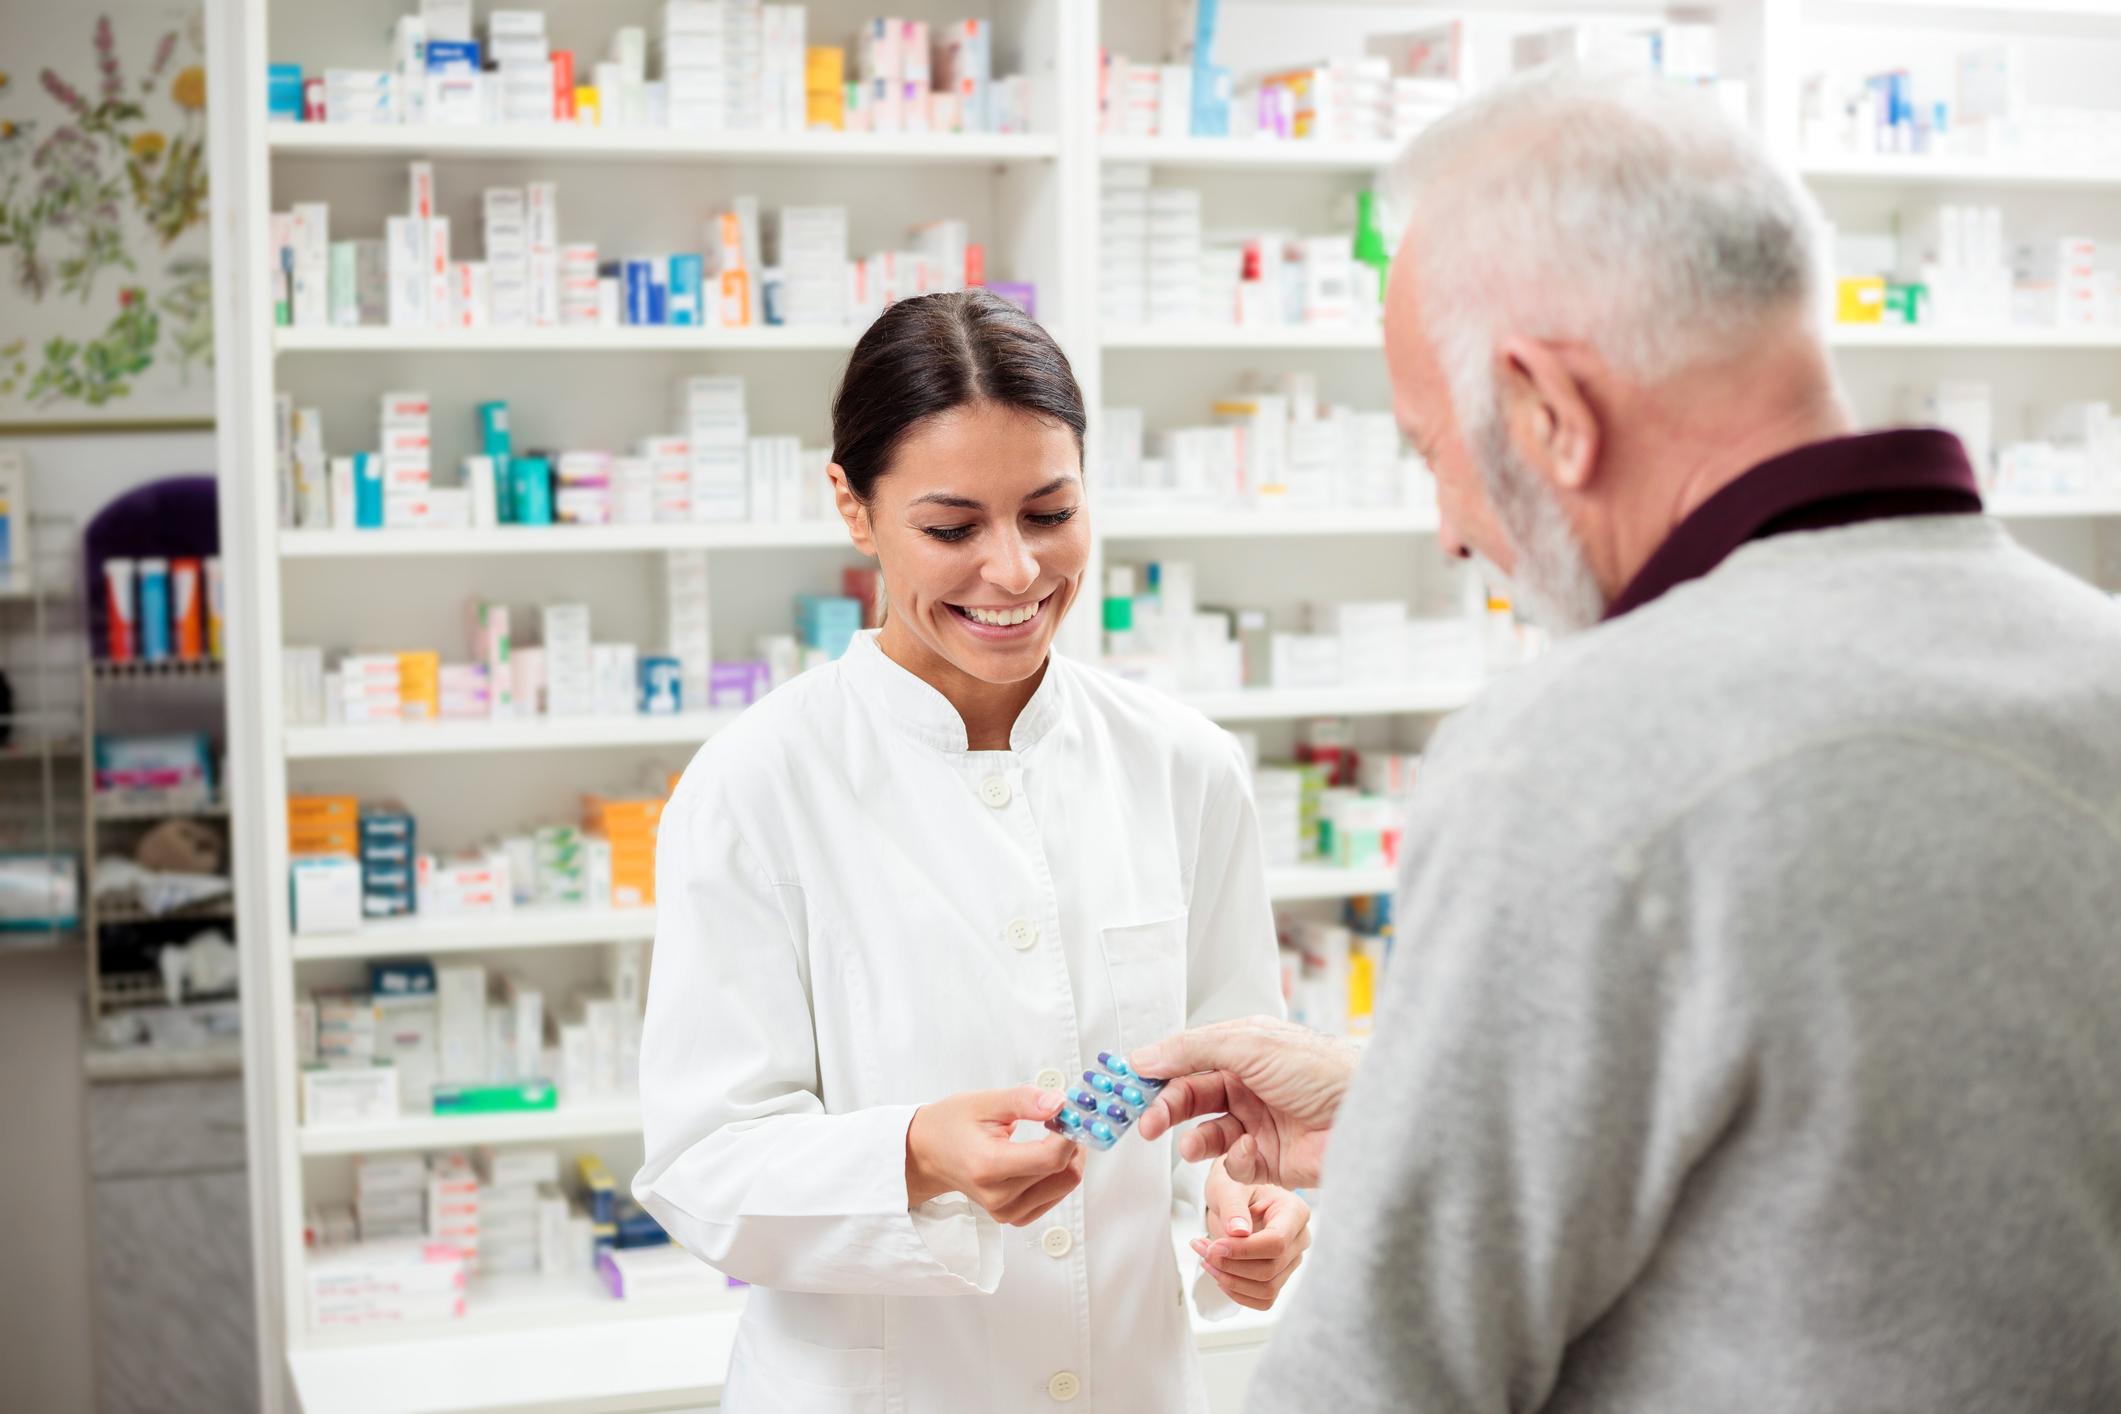 A pharmacist helps an older male customer.